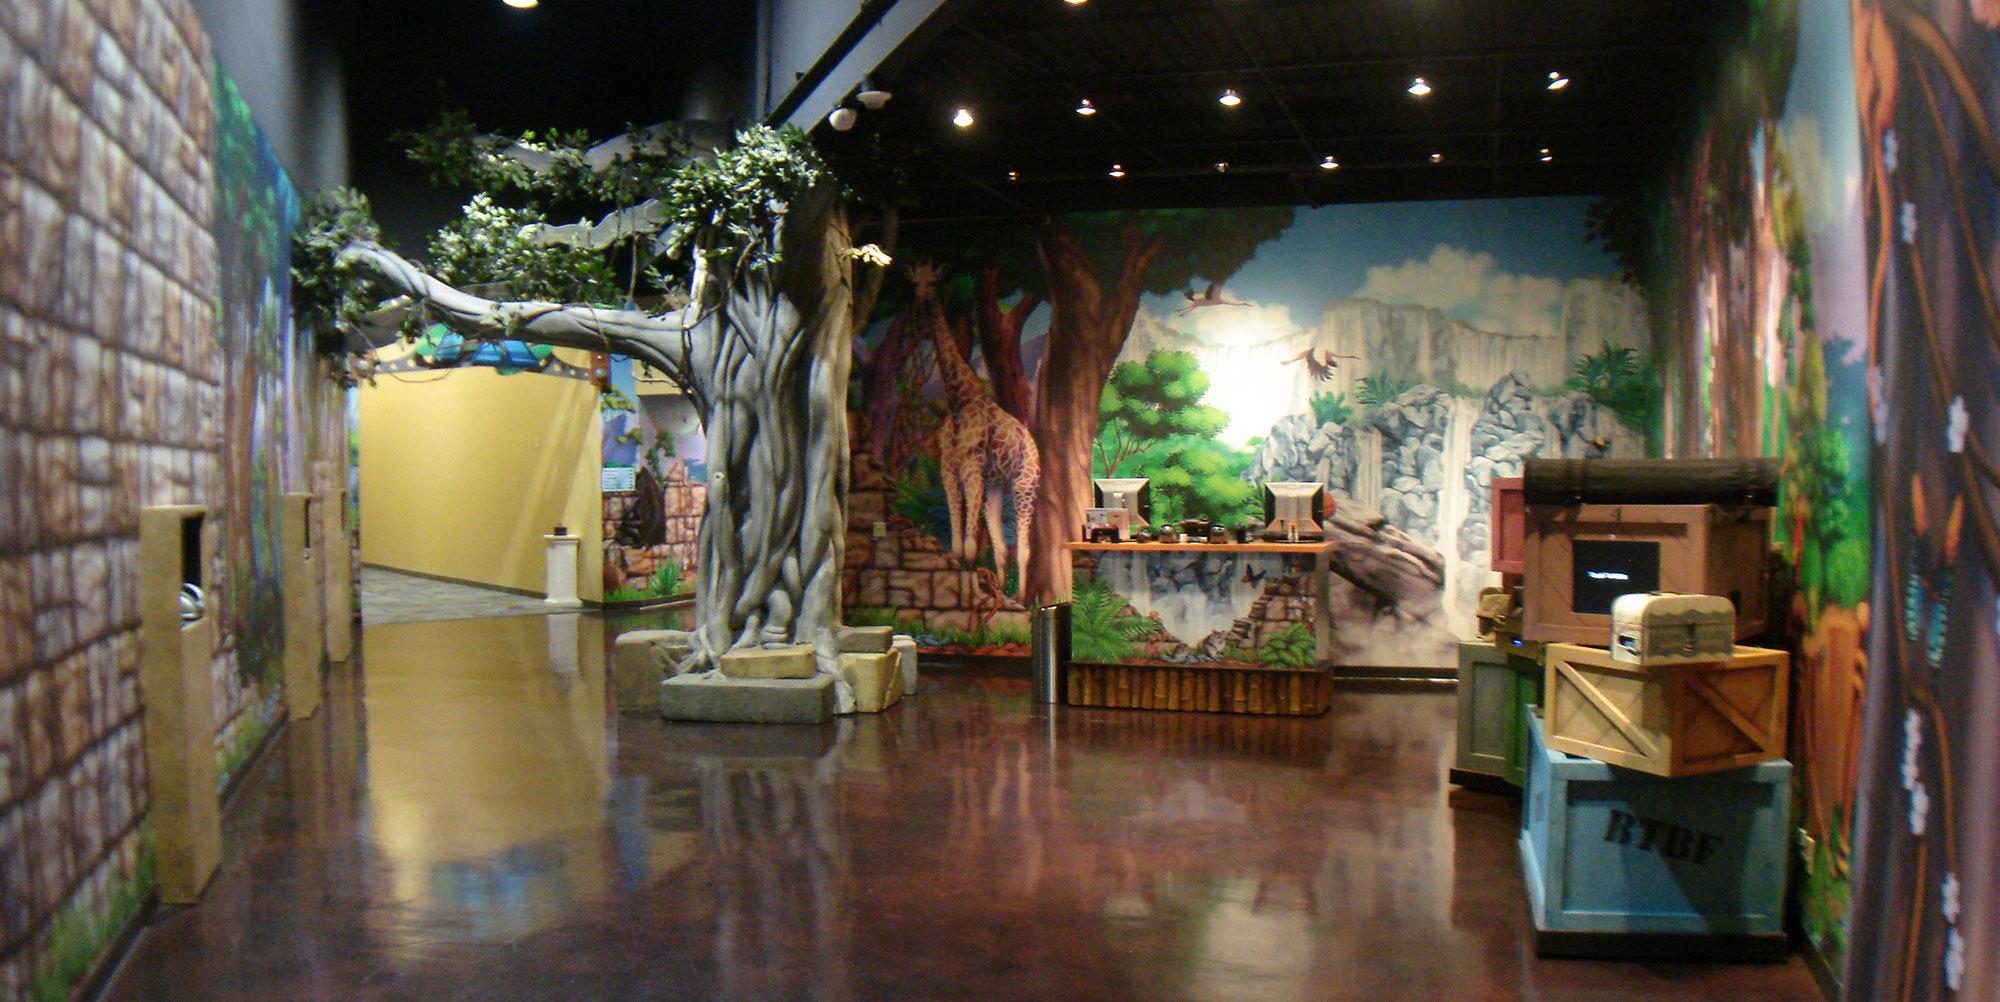 Jungle Themed Environment at Bent Tree Bible Fellowship